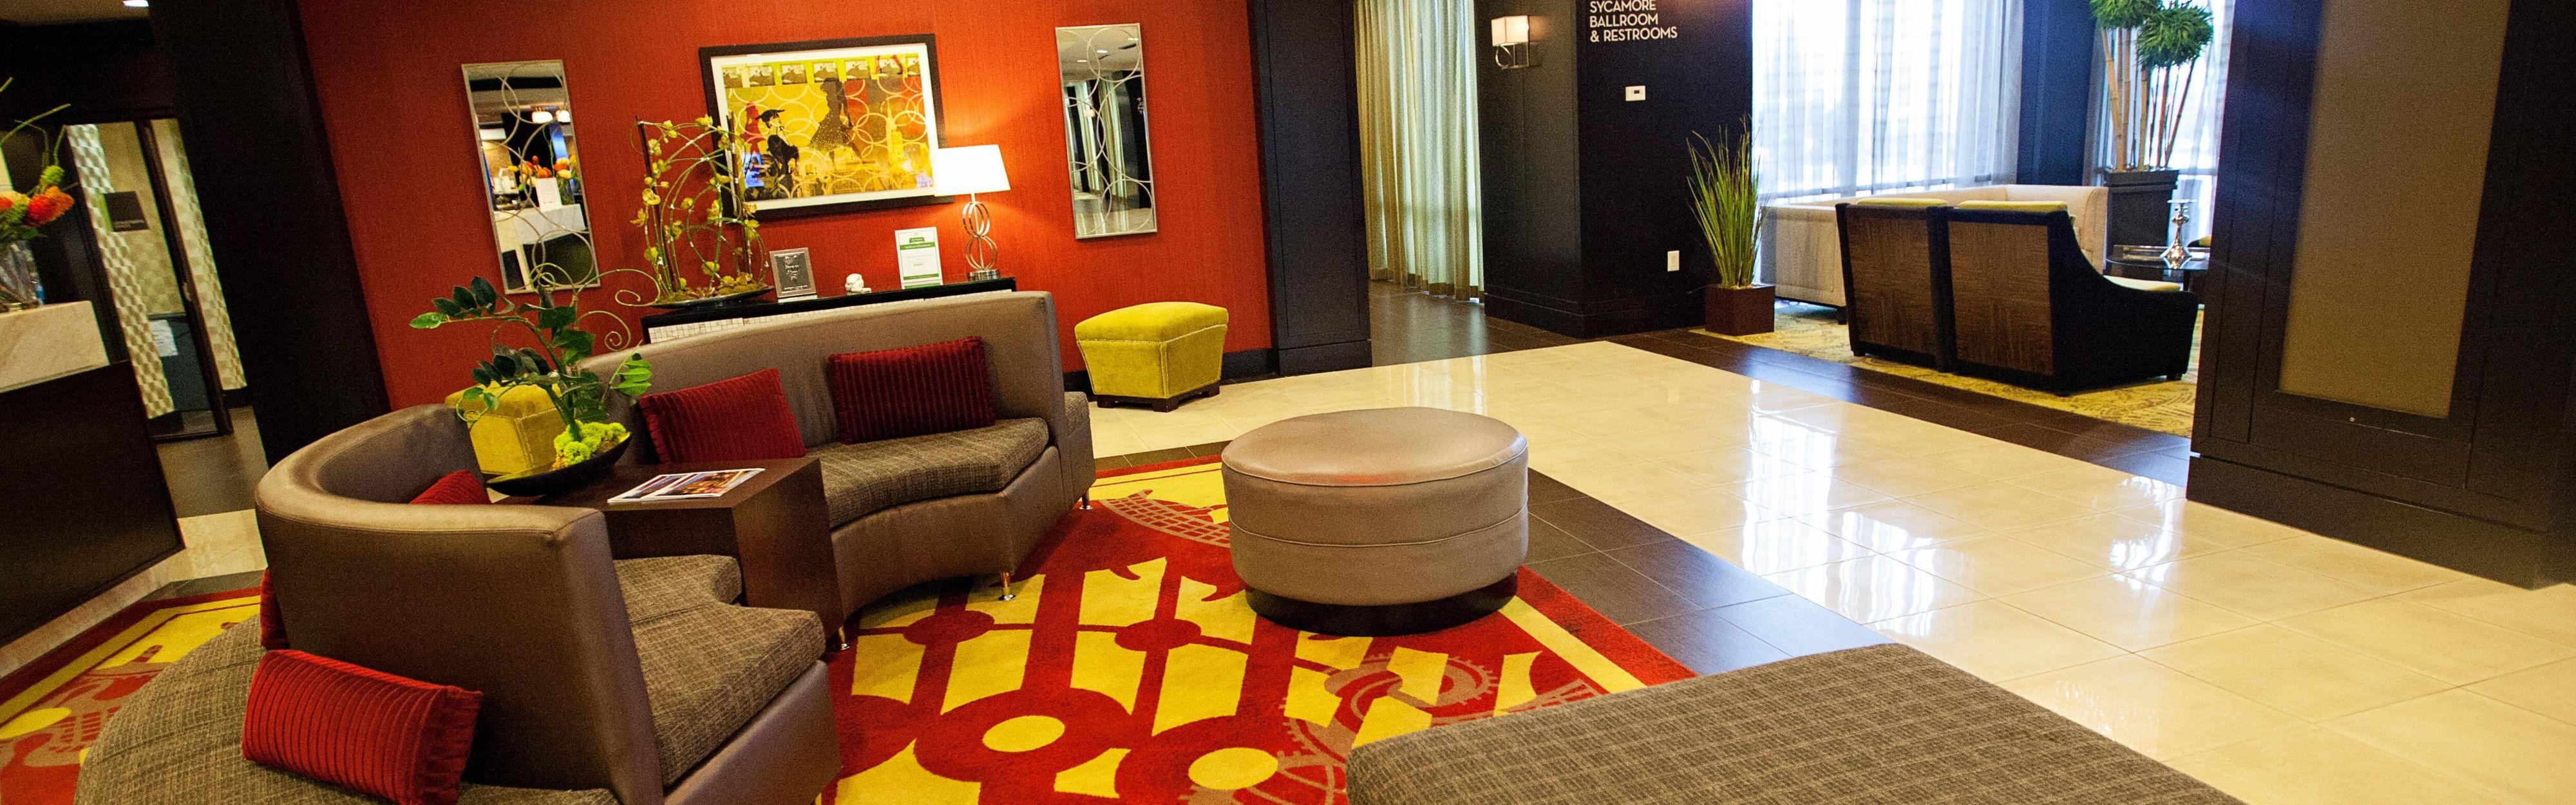 Crowne Plaza Houston Galleria Area image 0